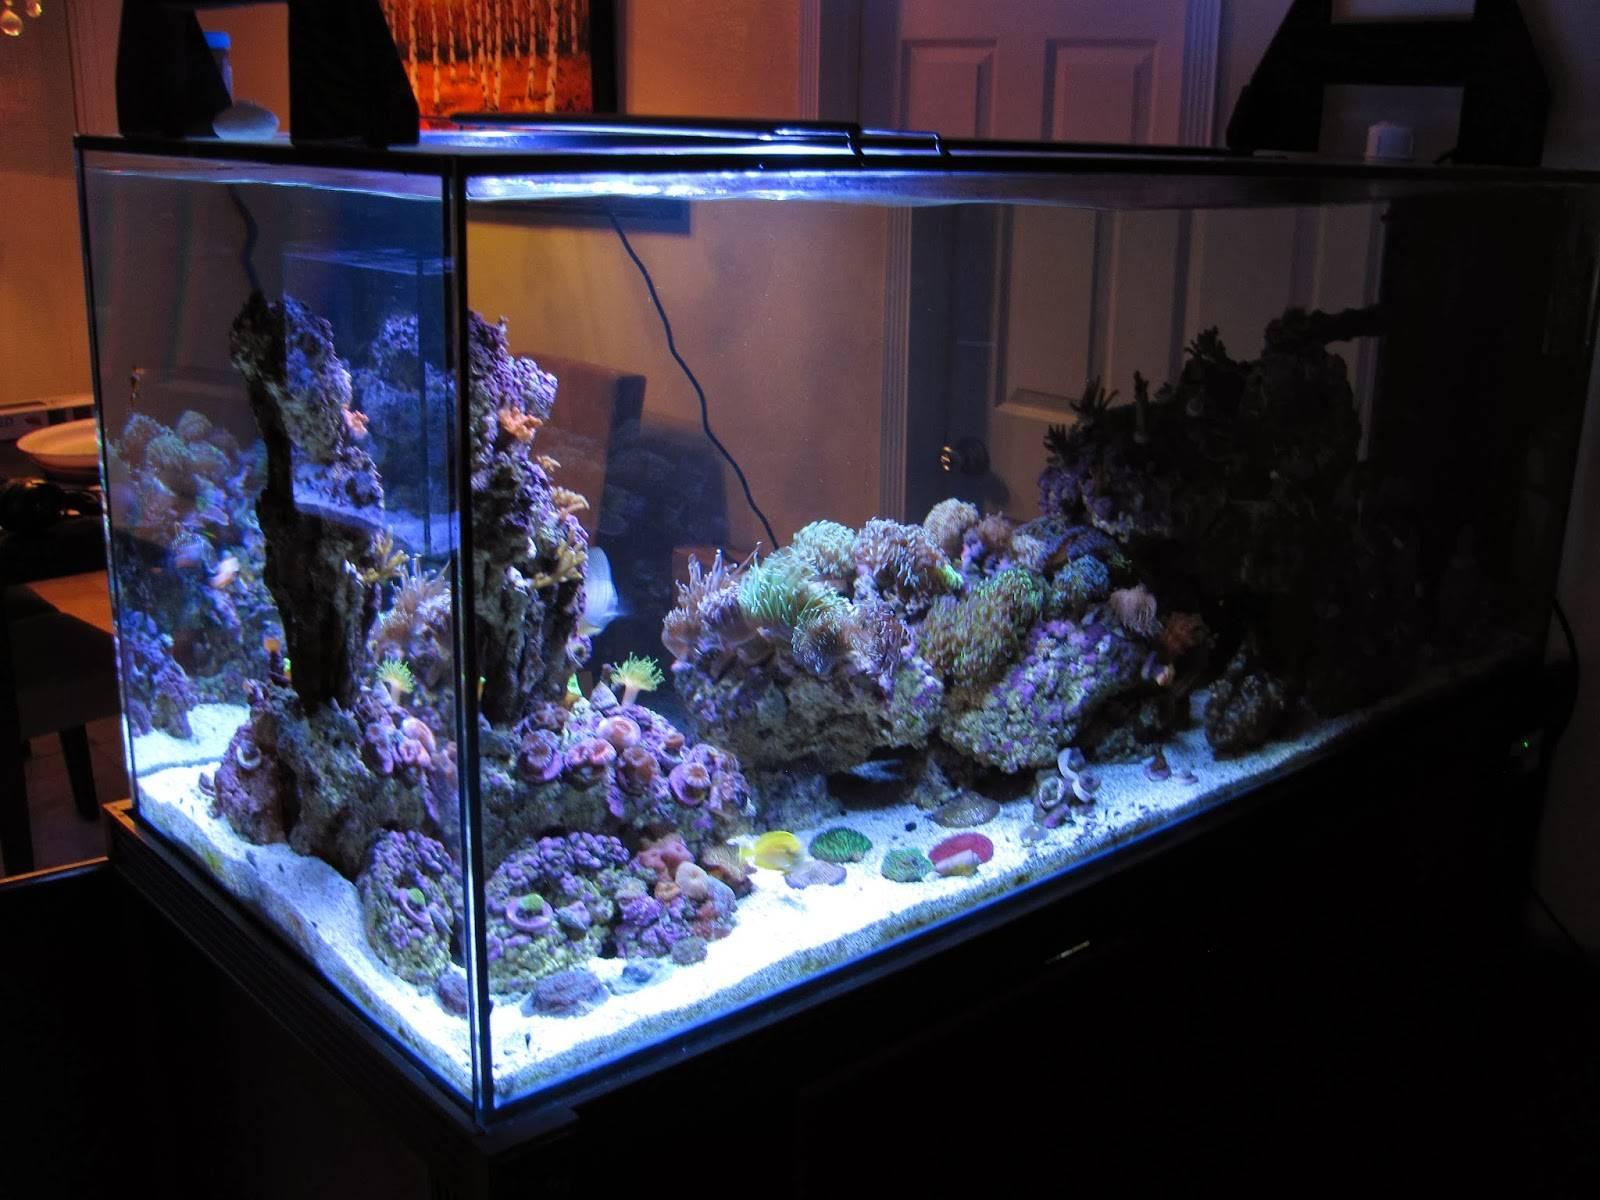 Orbit Marine LED Aquarium Light beauty shot